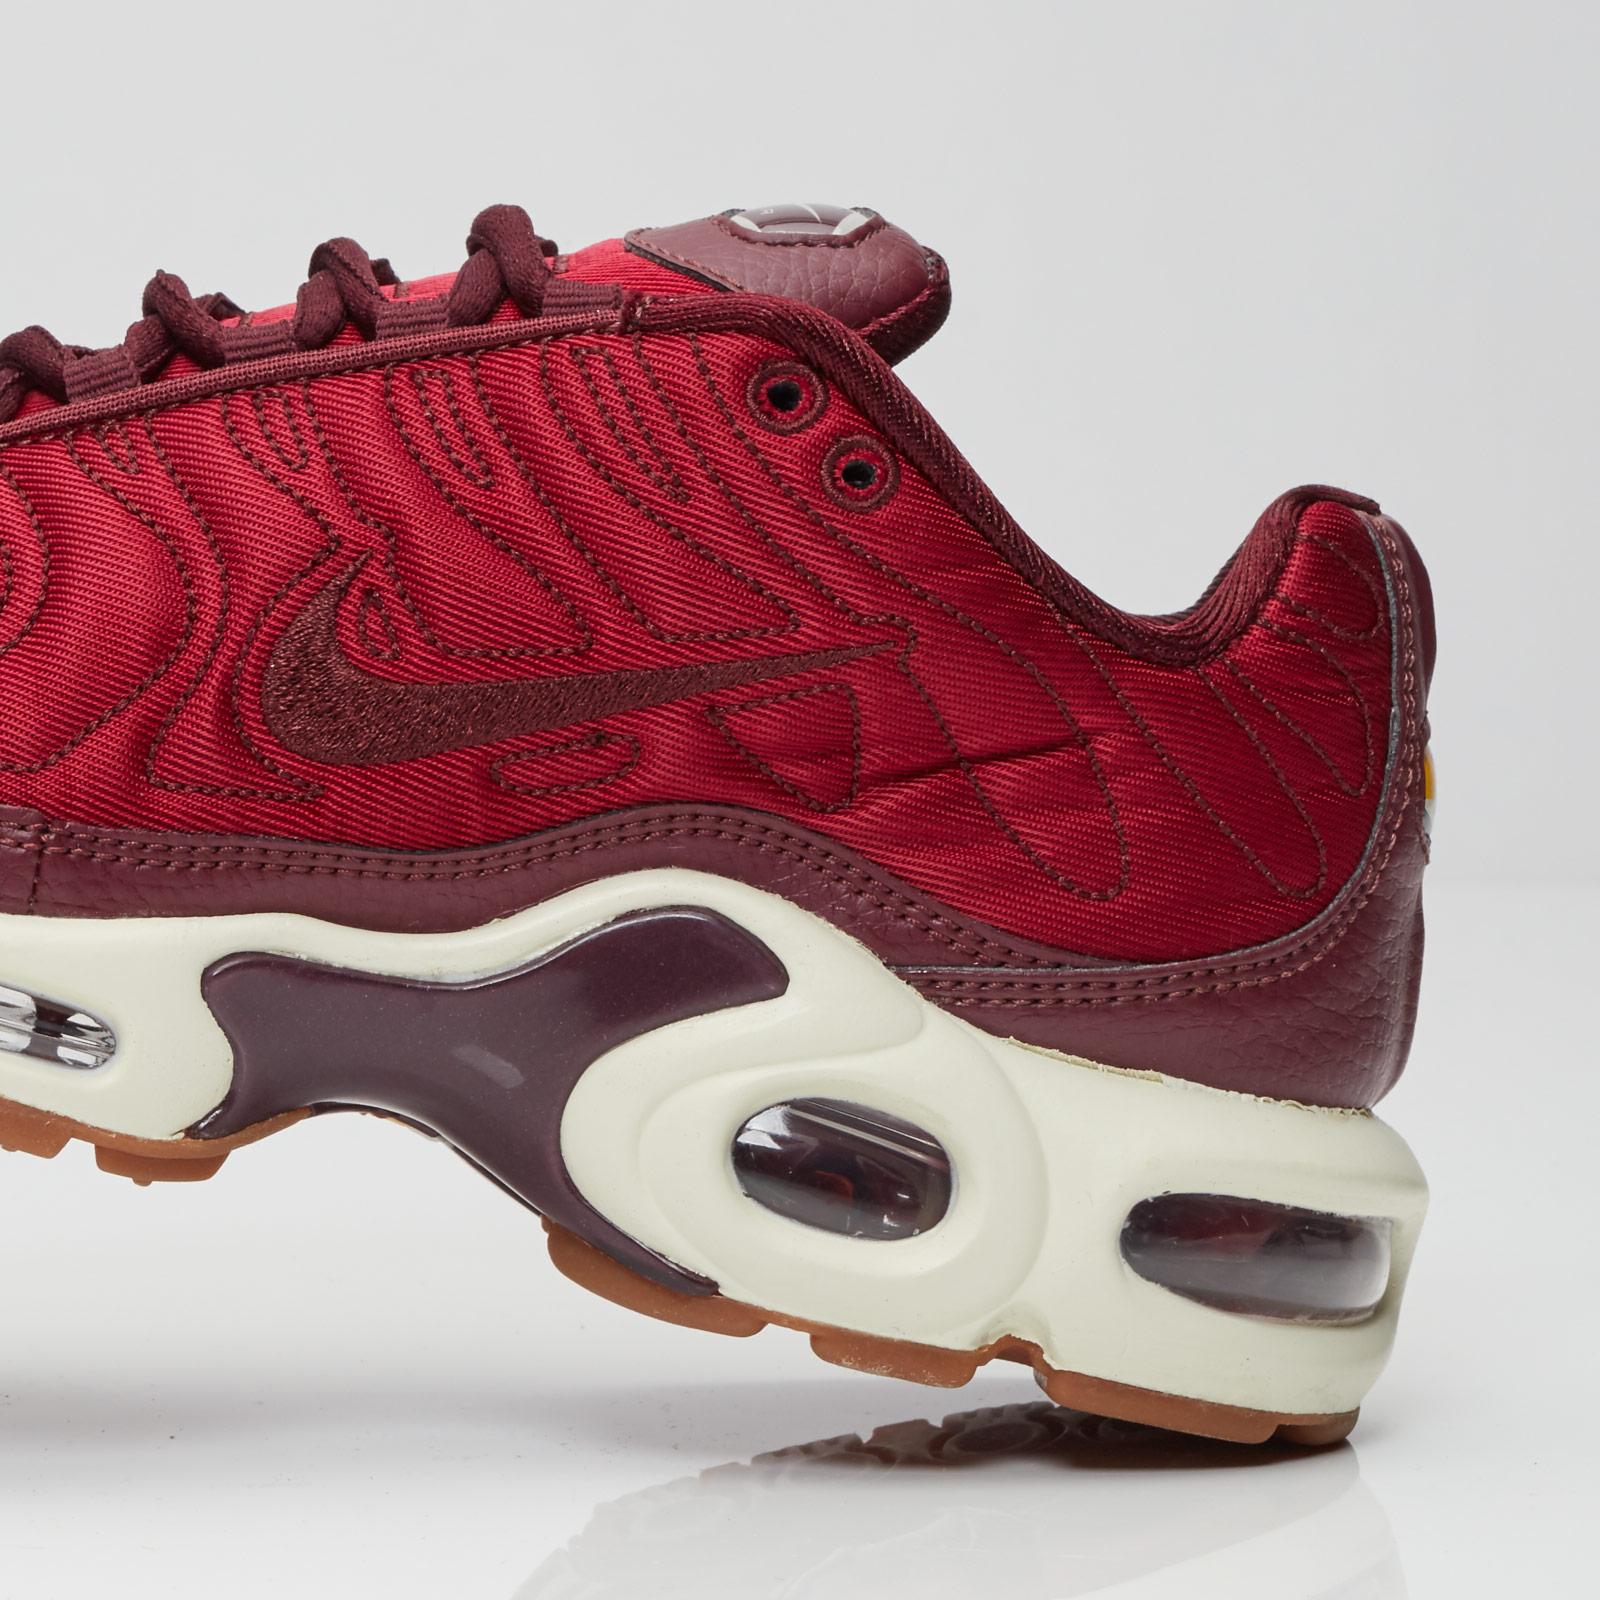 ef5c7e4f32 Nike Wmns Air Max Plus Premium - 848891-600 - Sneakersnstuff | sneakers &  streetwear online since 1999